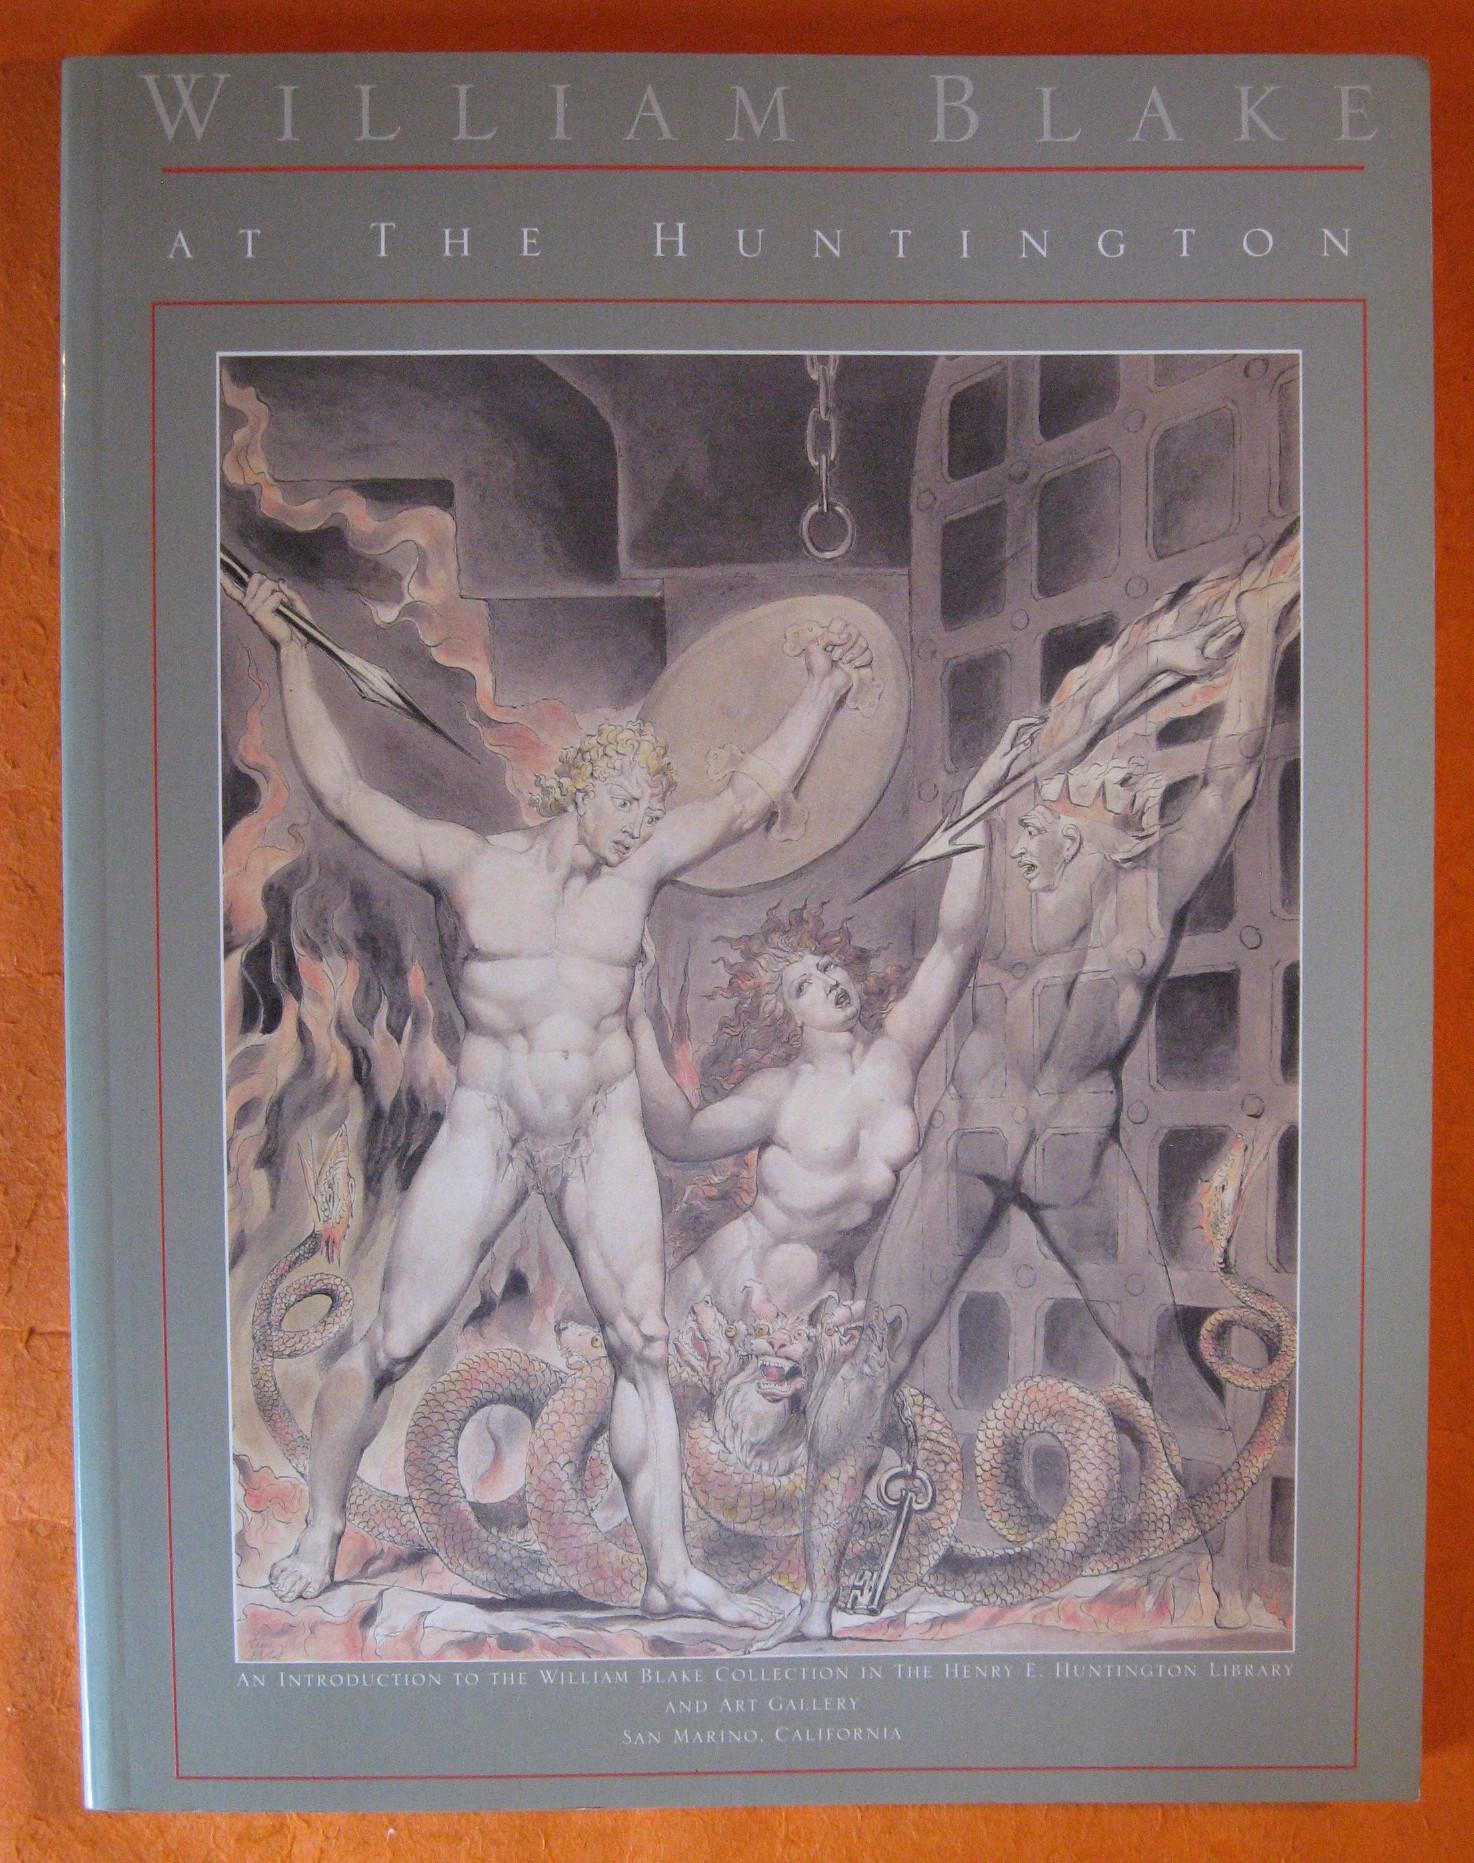 William Blake at the Huntington: An Introduction to the William Blake Collection in the Henry E. Huntington Library and Art Gallery, San Marino, California, Robert N. Essick